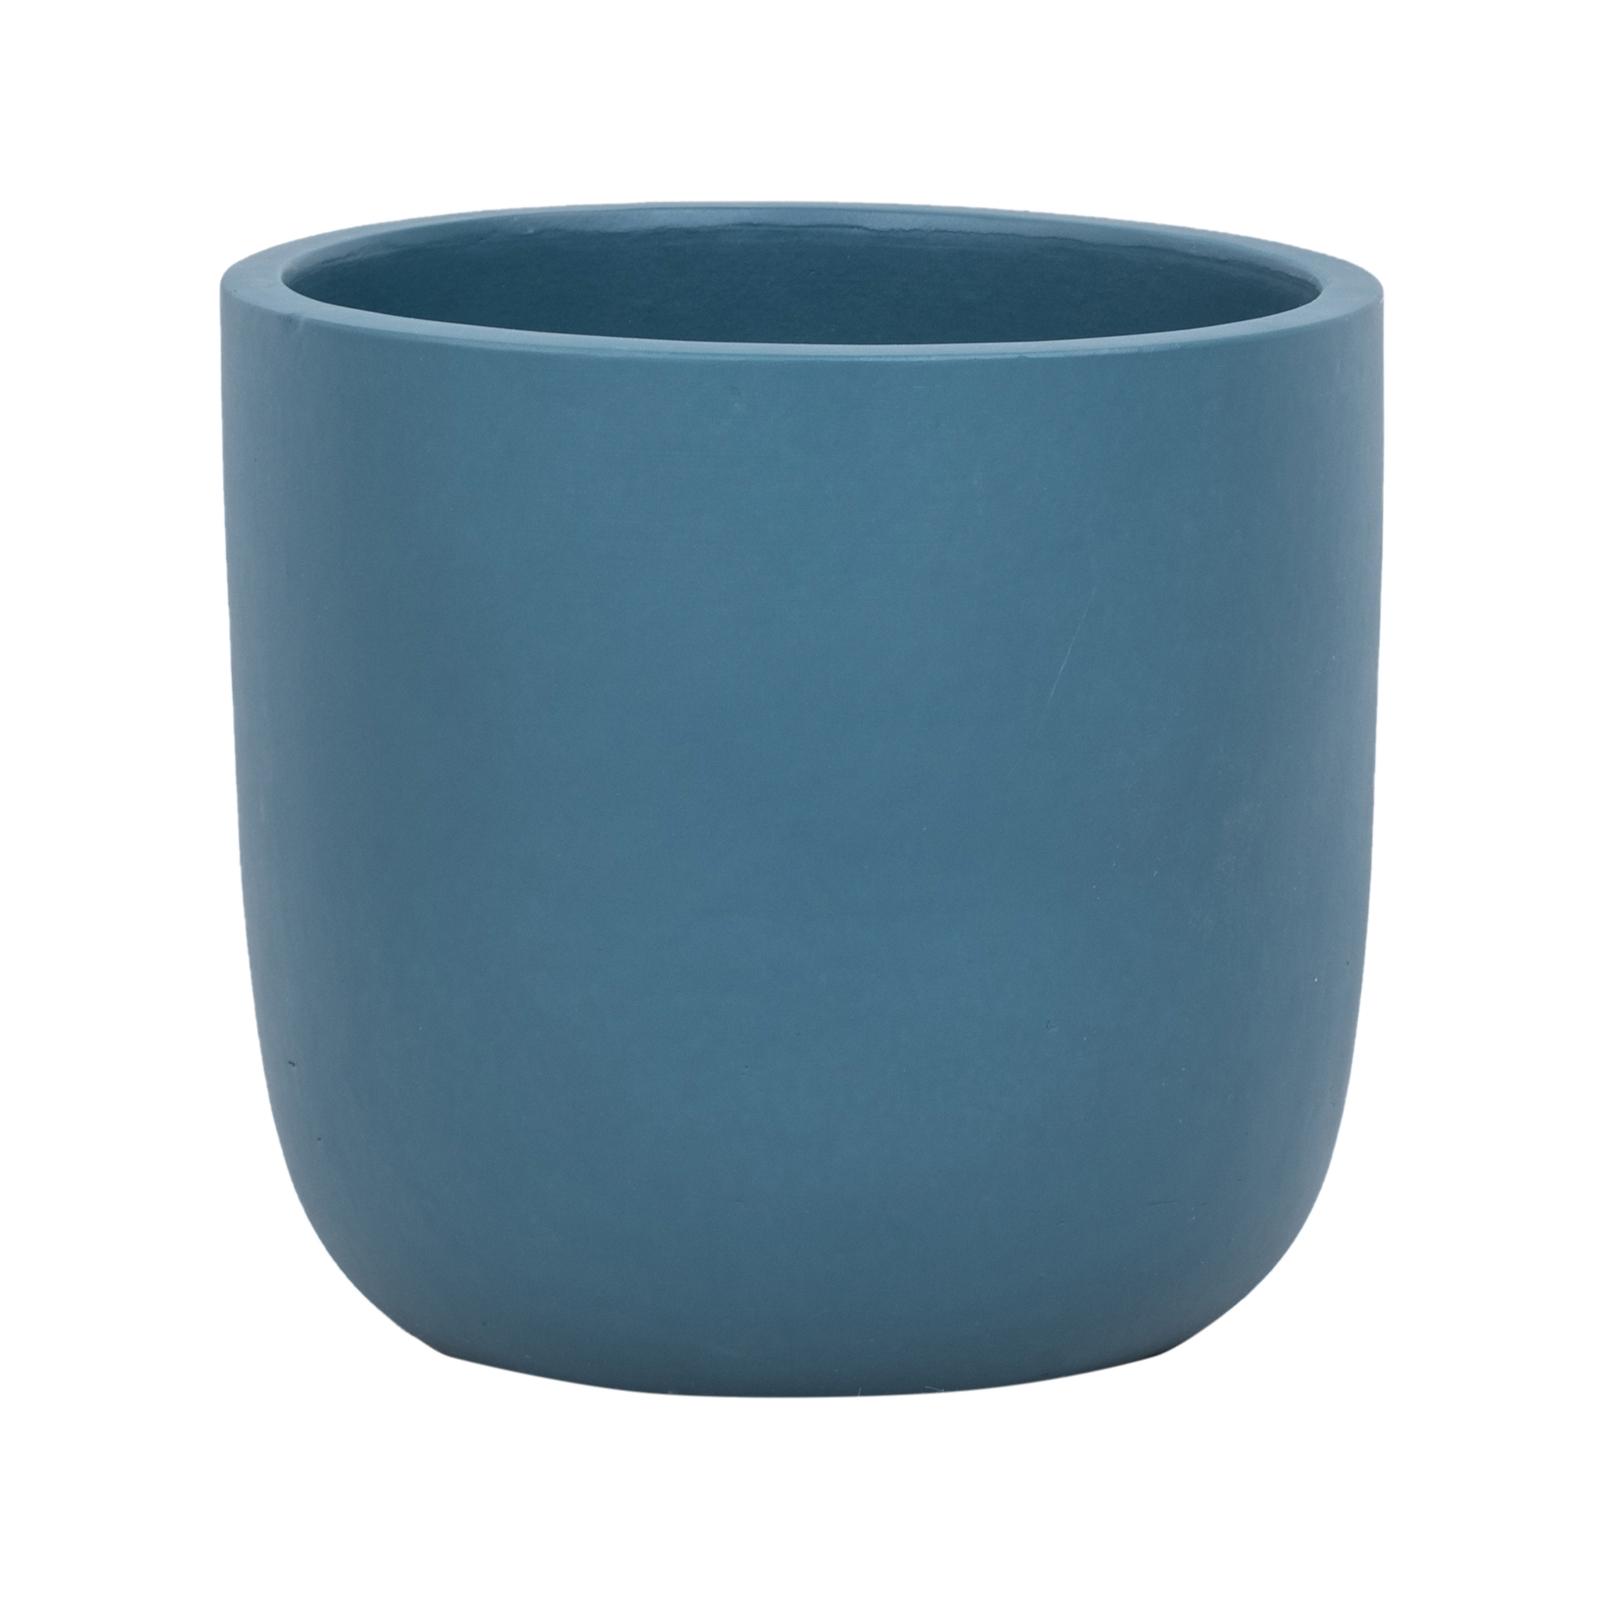 Lotus 28 x 25cm Navy XL Plain Ceramic Egg Pot